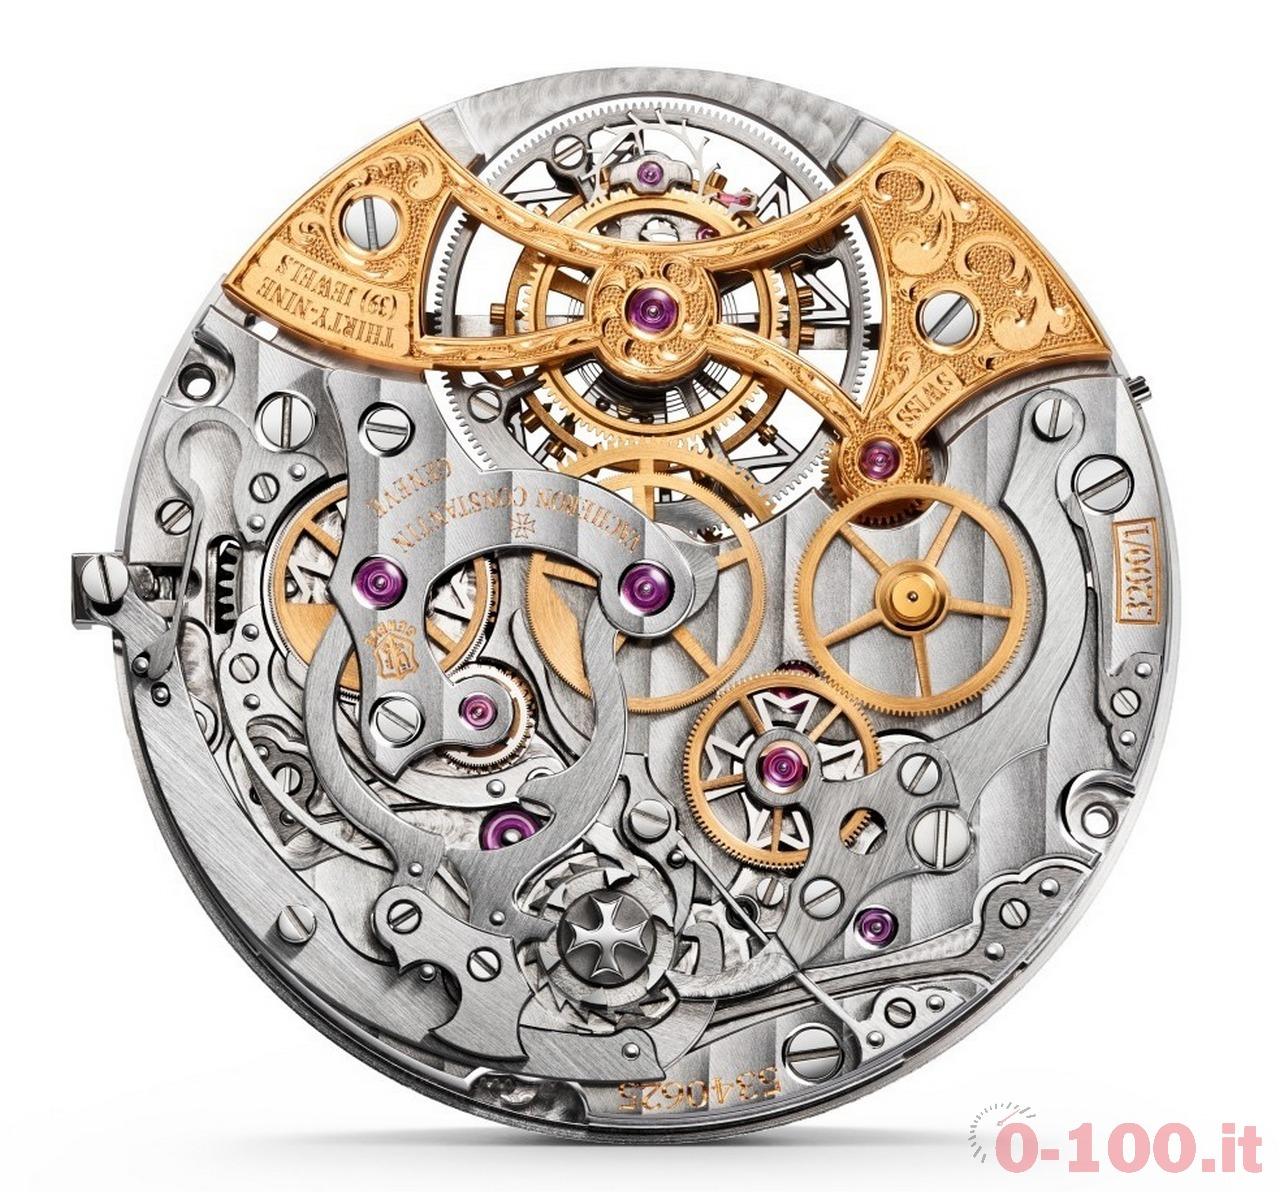 sihh-2015-vacheron-constantin-harmony-cronografo-tourbillon-calibro-3200-ref-5100s000p-b056-limited-edition_0-100_10